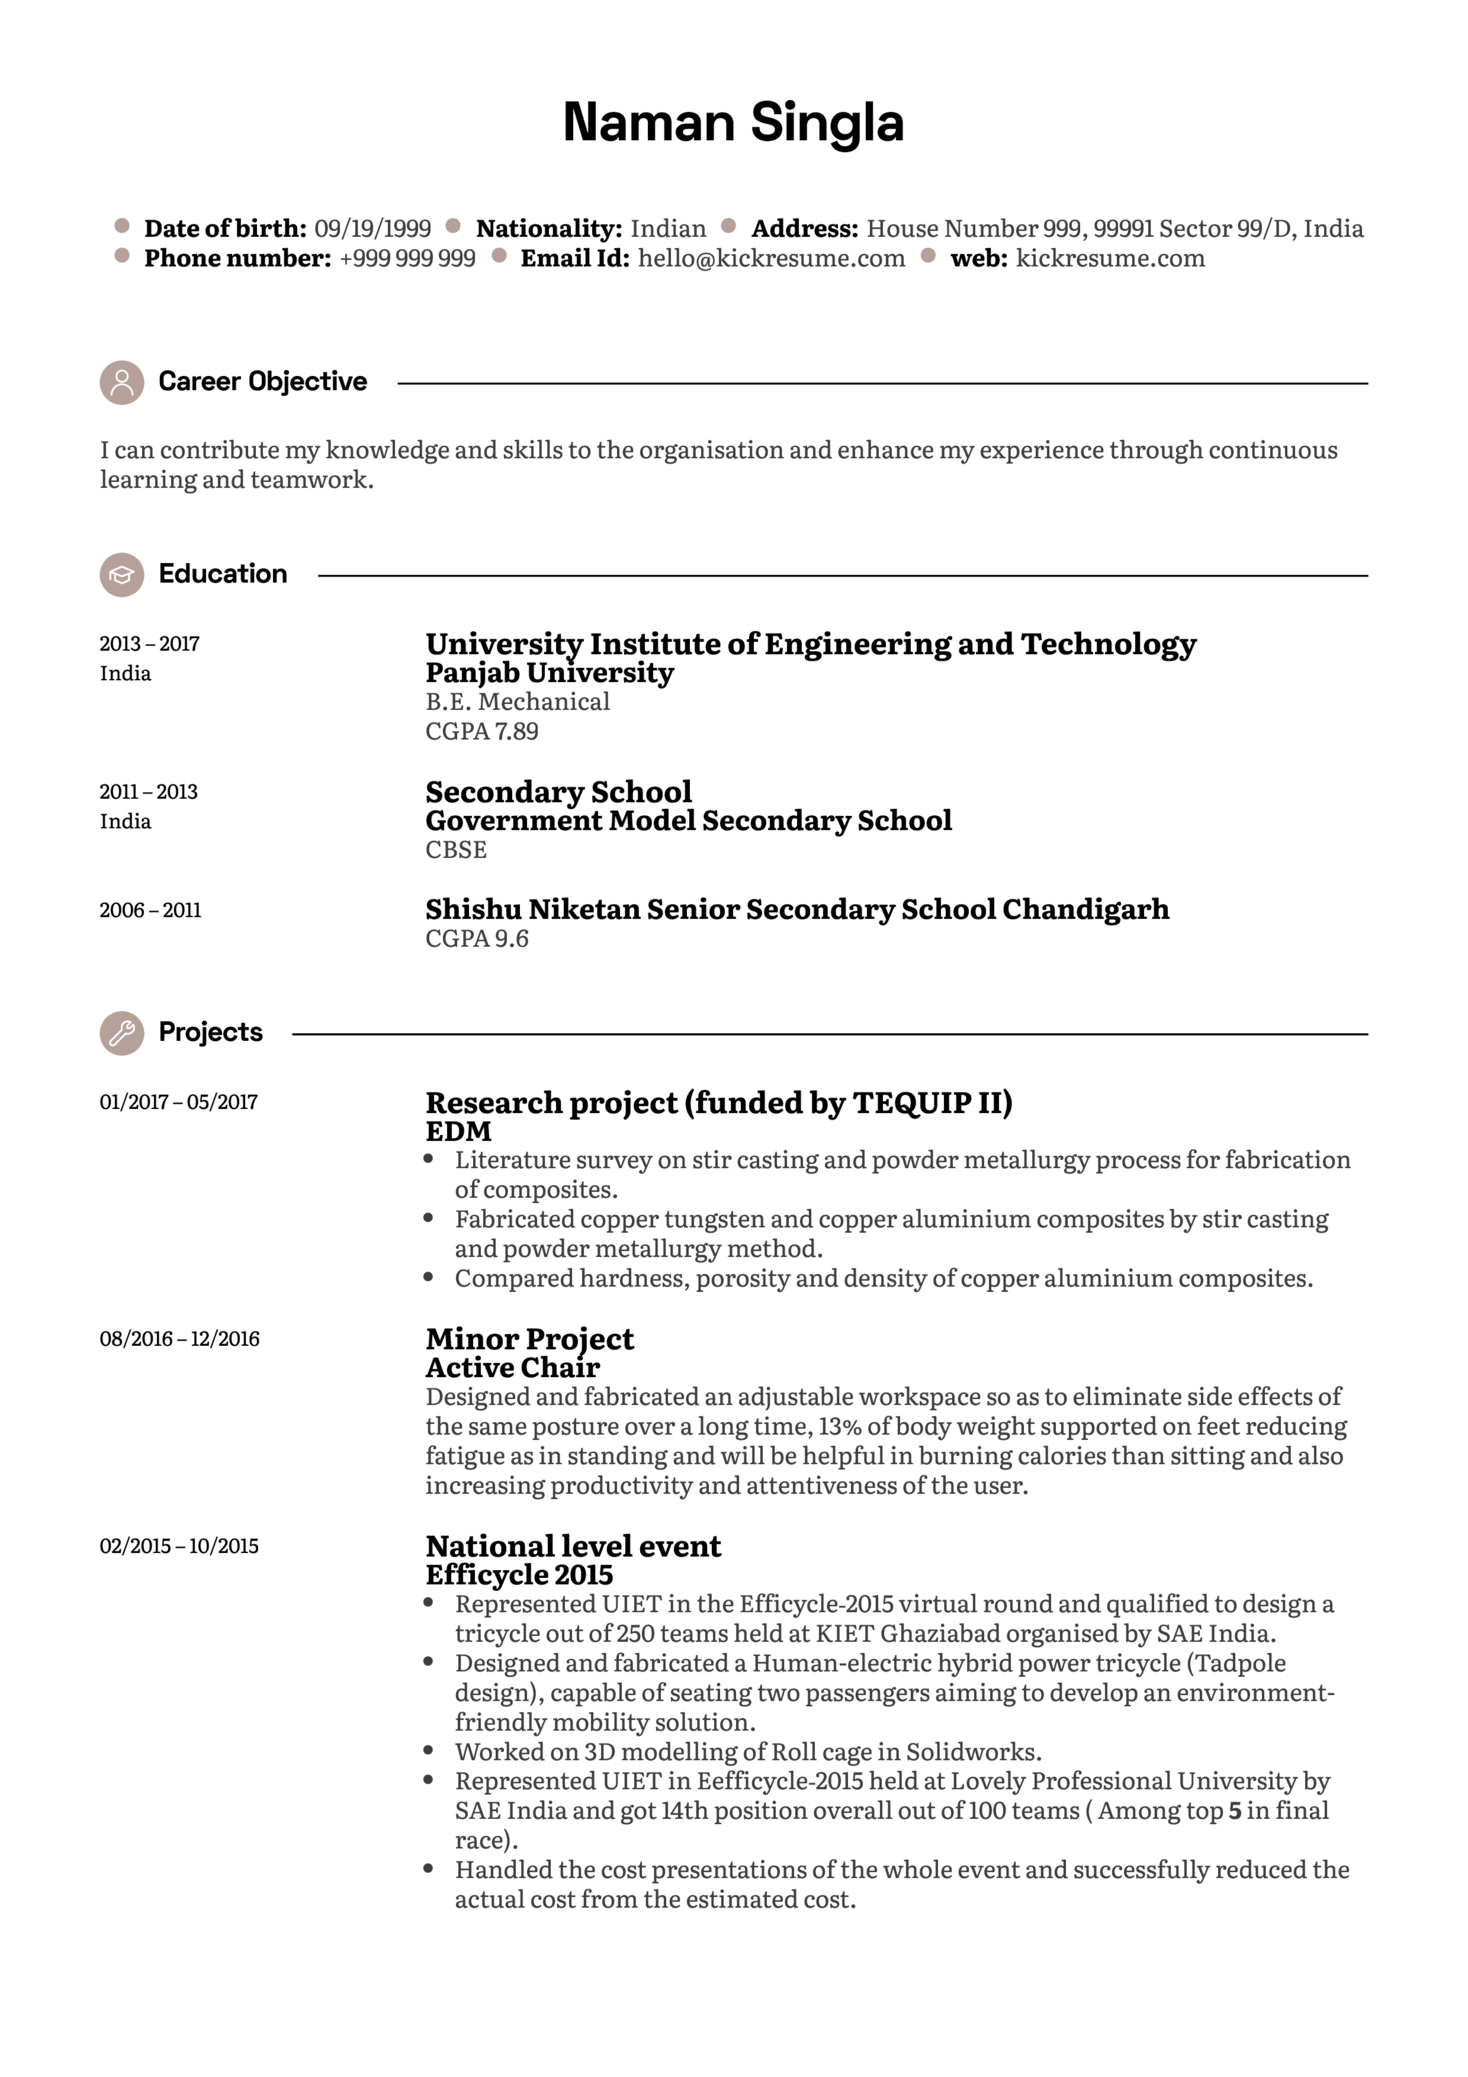 Junior Research Analyst CV Sample (parte 1)